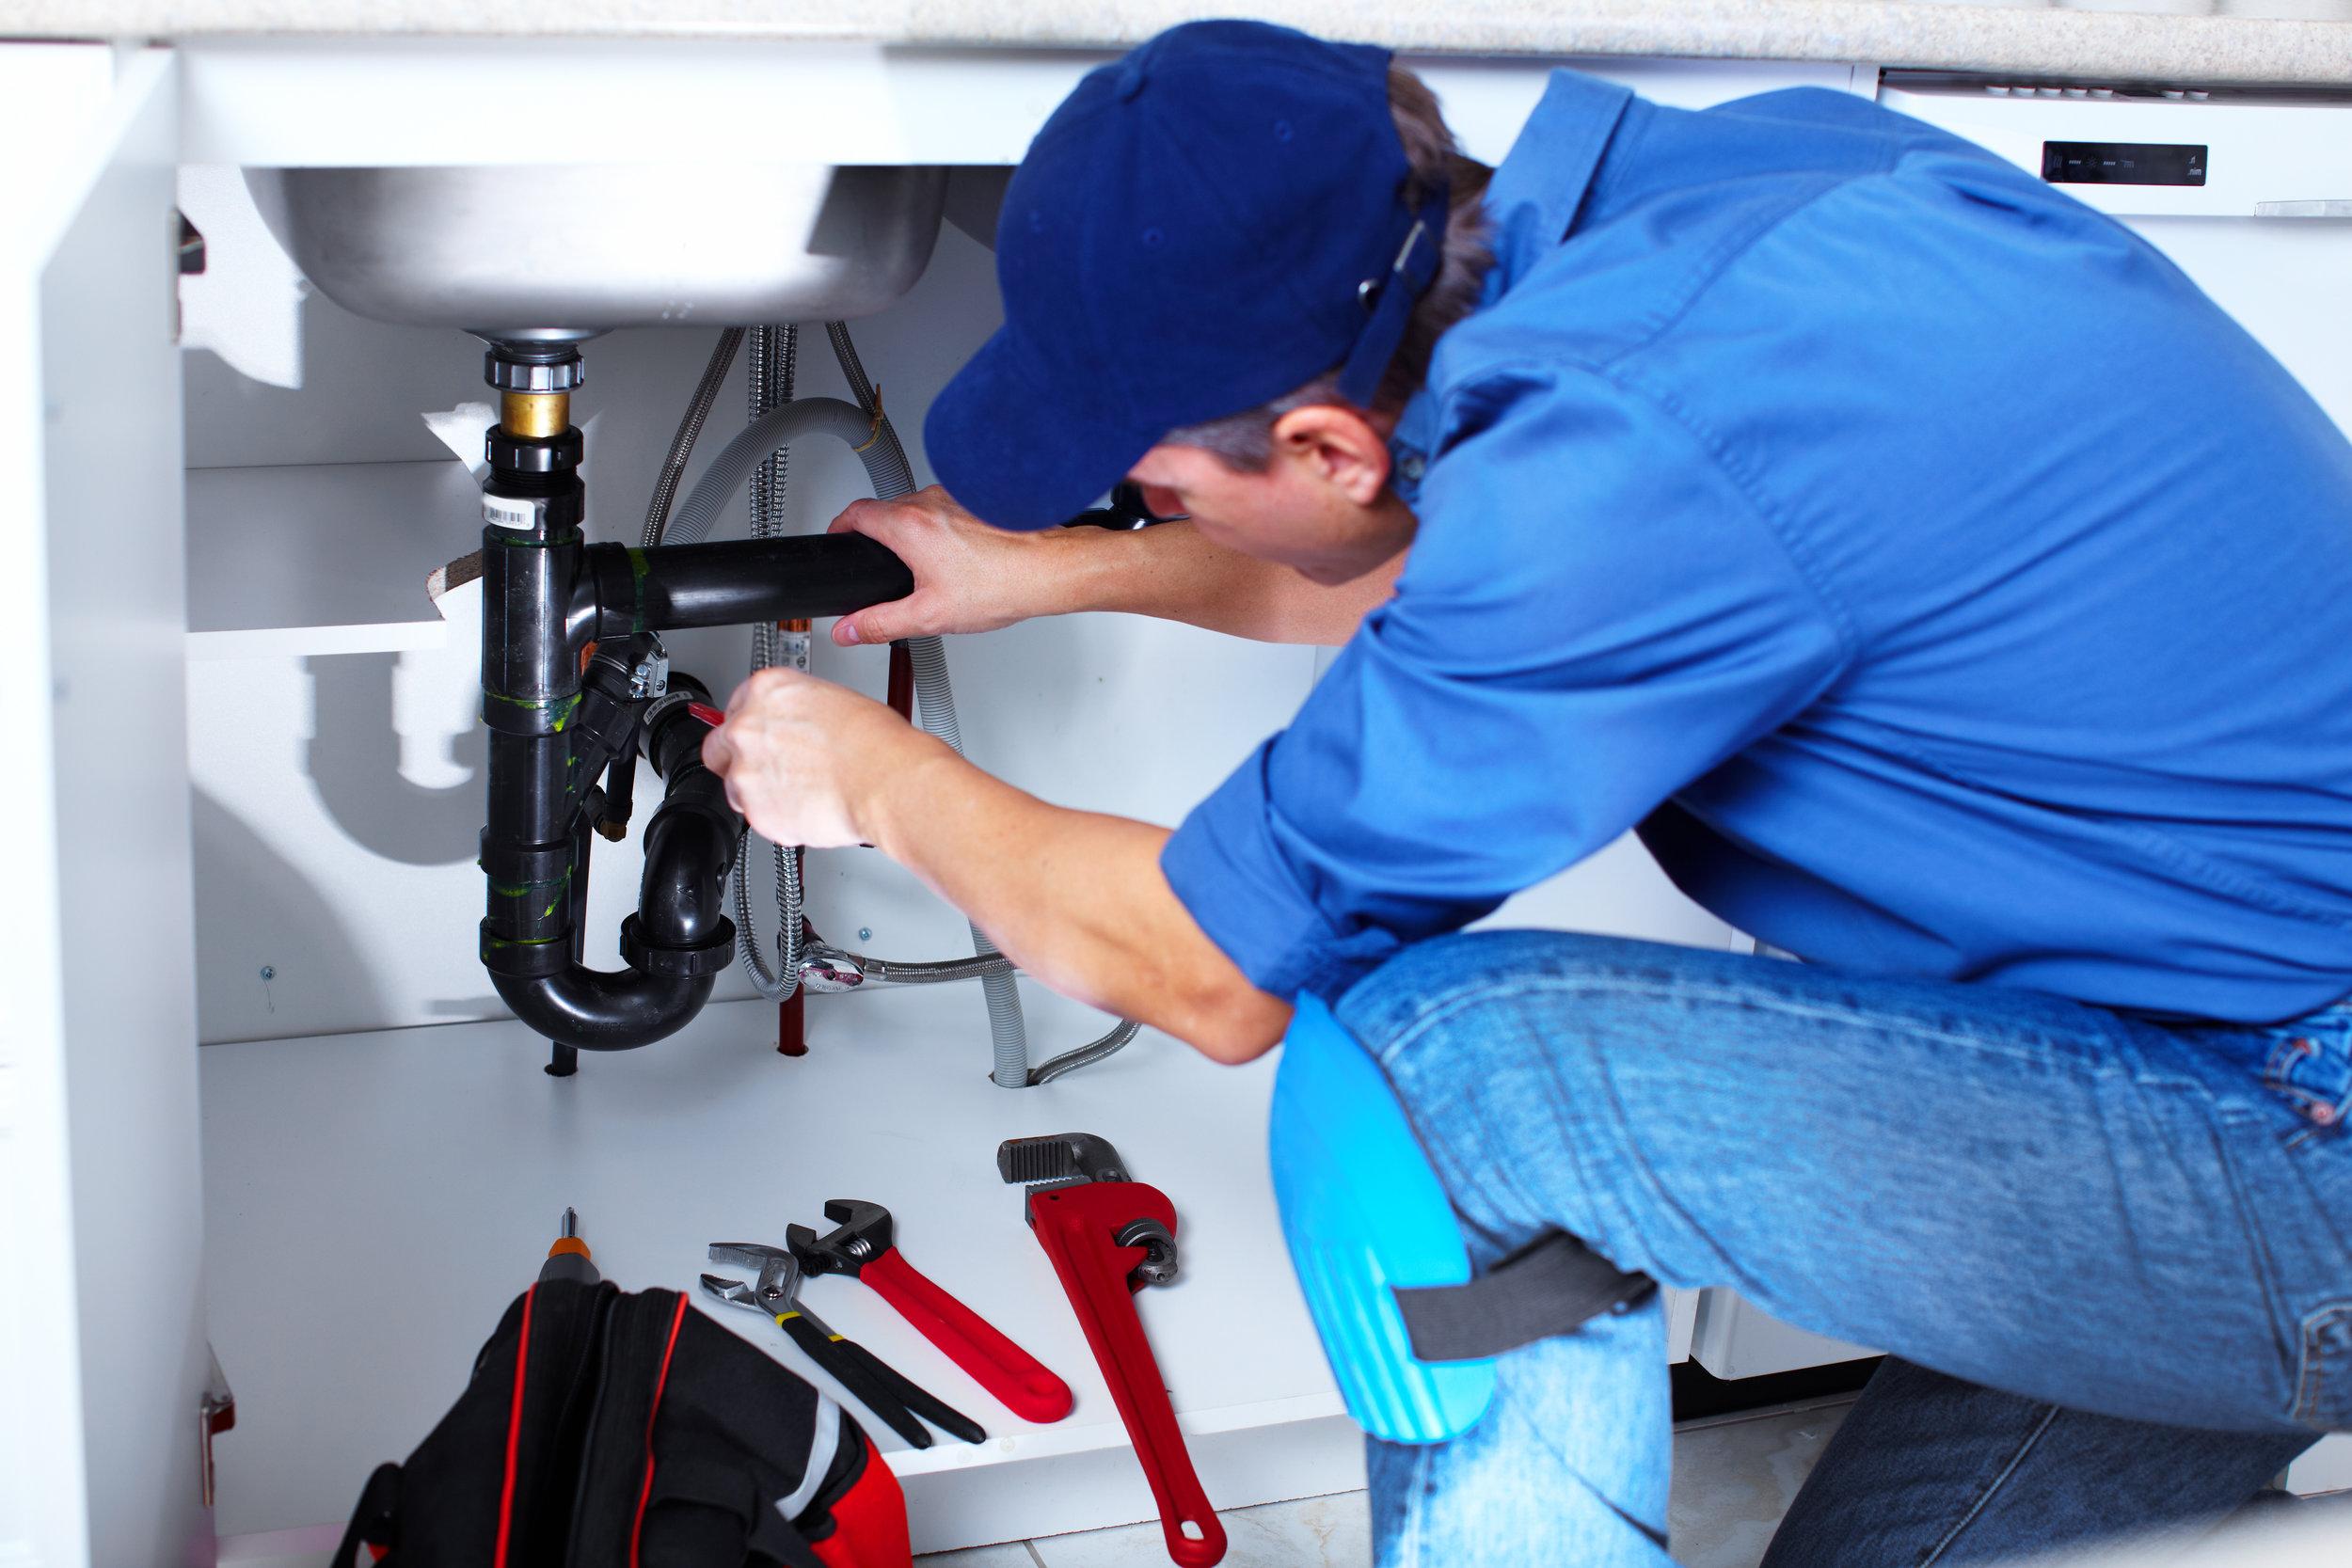 Plumber repairing sink pipes